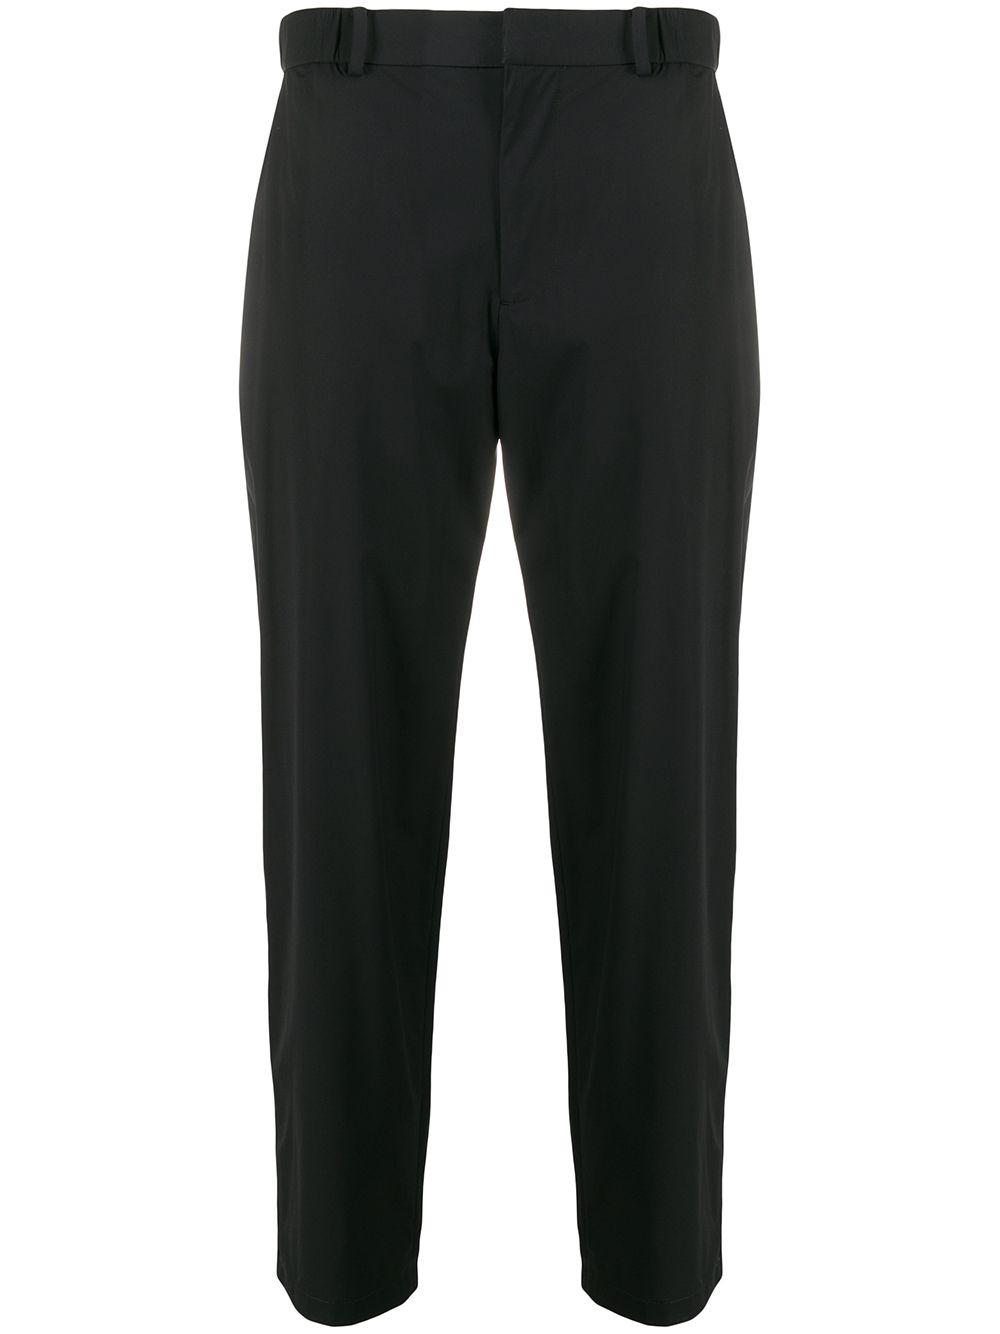 High-tech Fabric Trousers